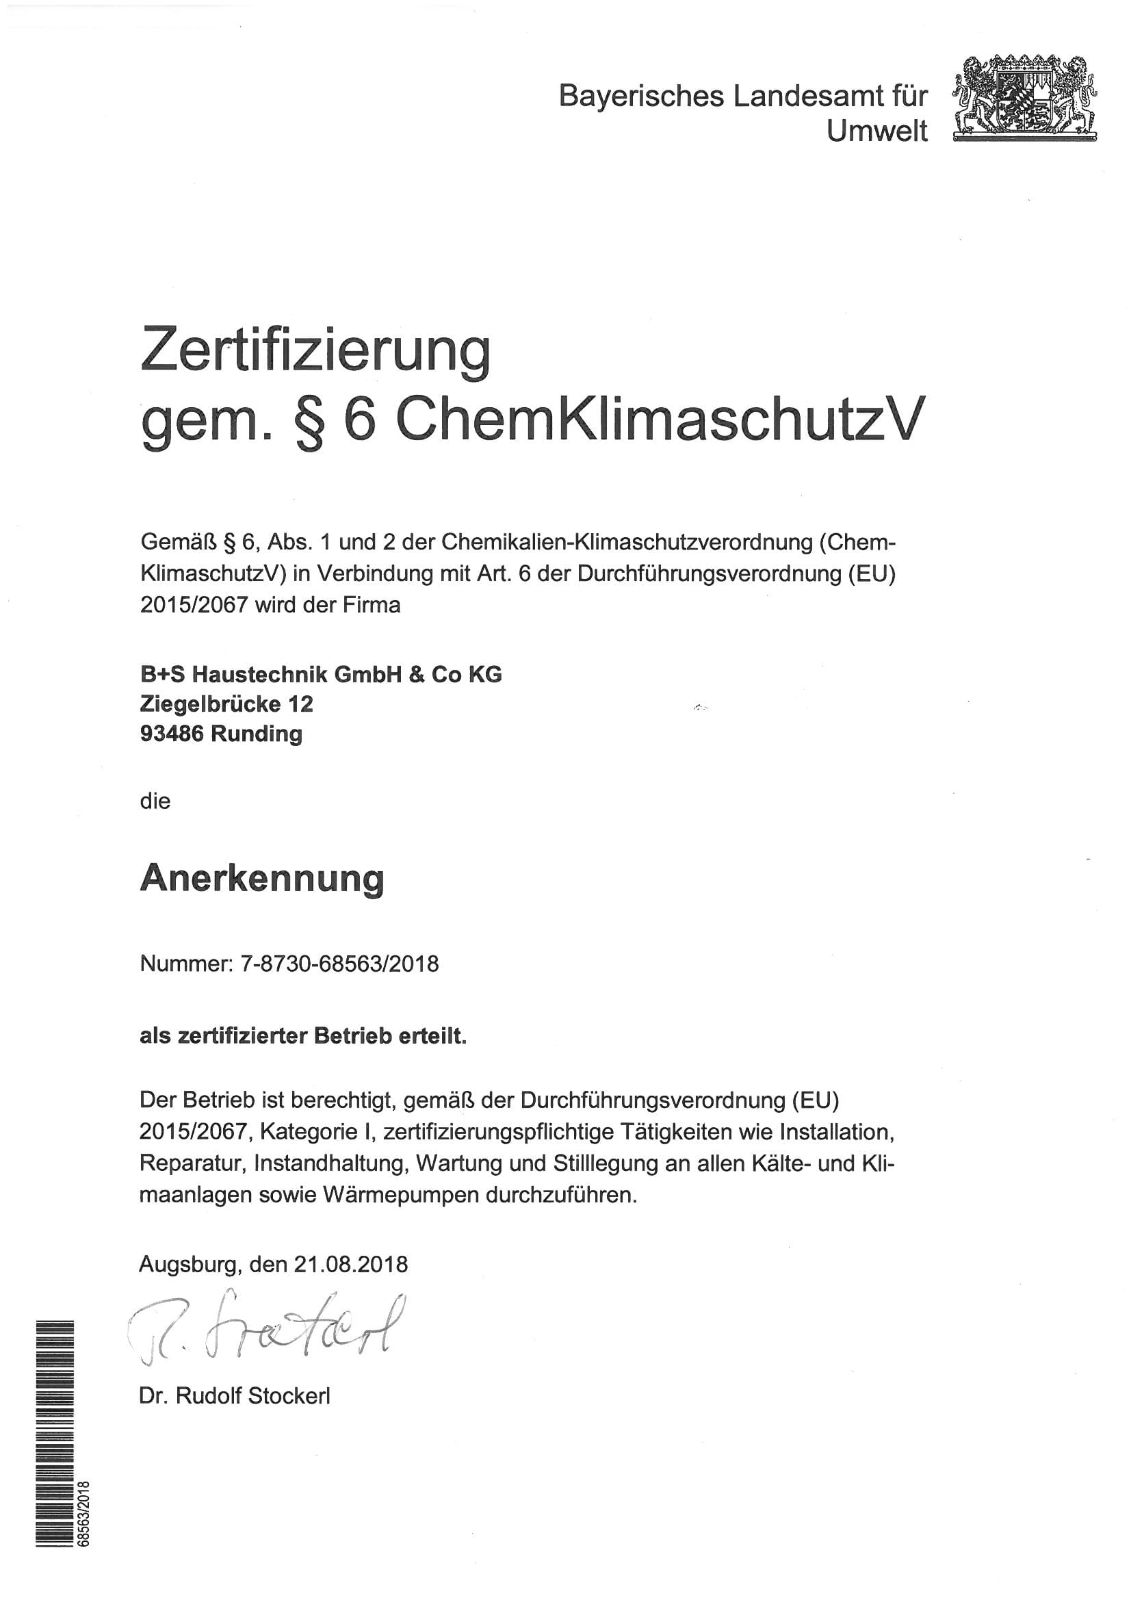 LfU-Zertifikat ChemKlimaschutzV-1